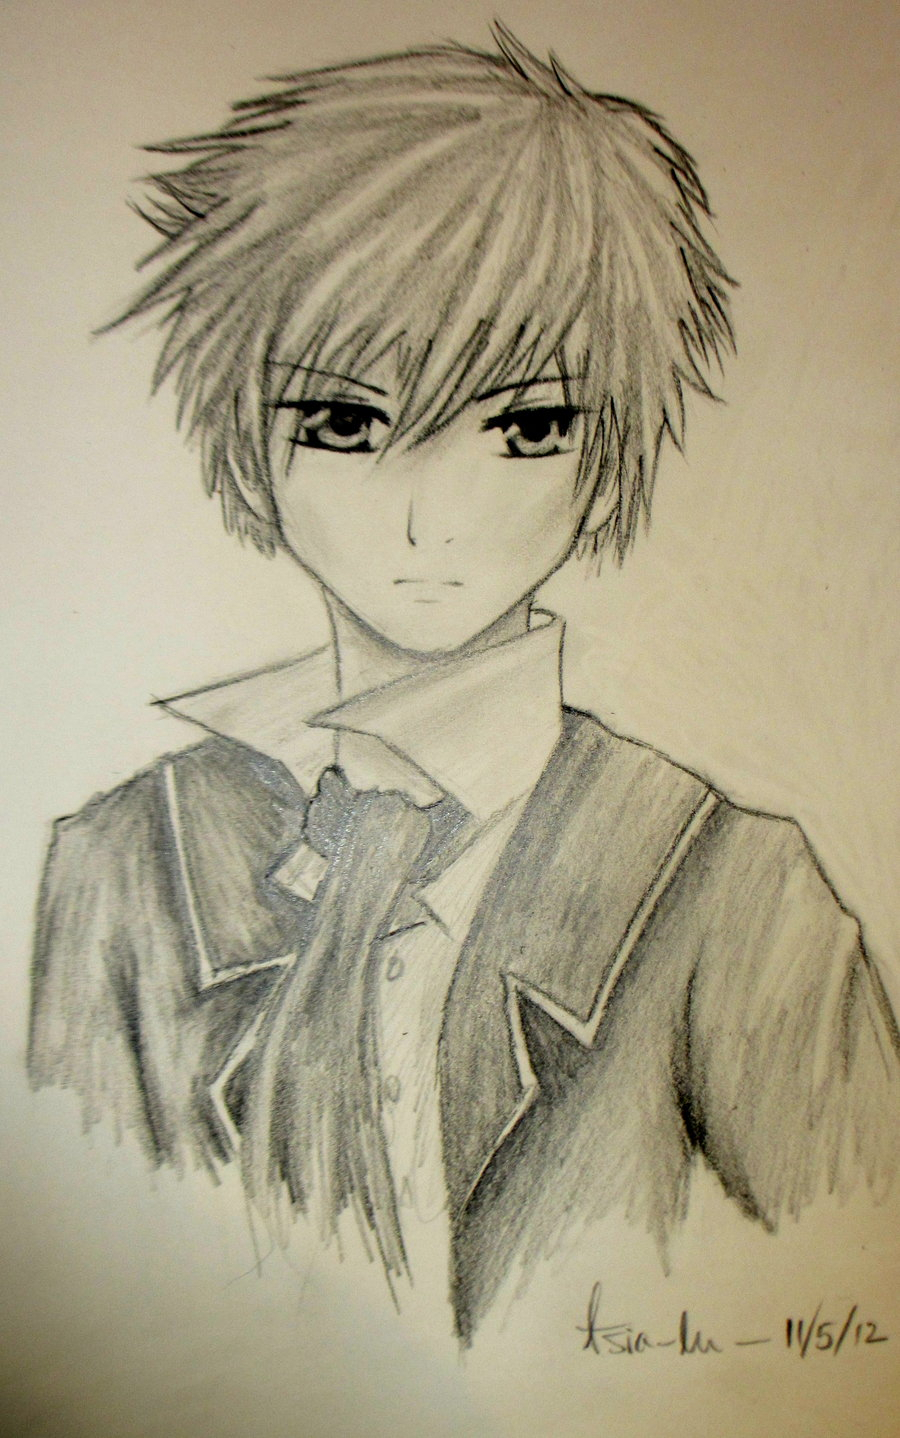 900x1438 Anime Boy Drawings Anime Boy